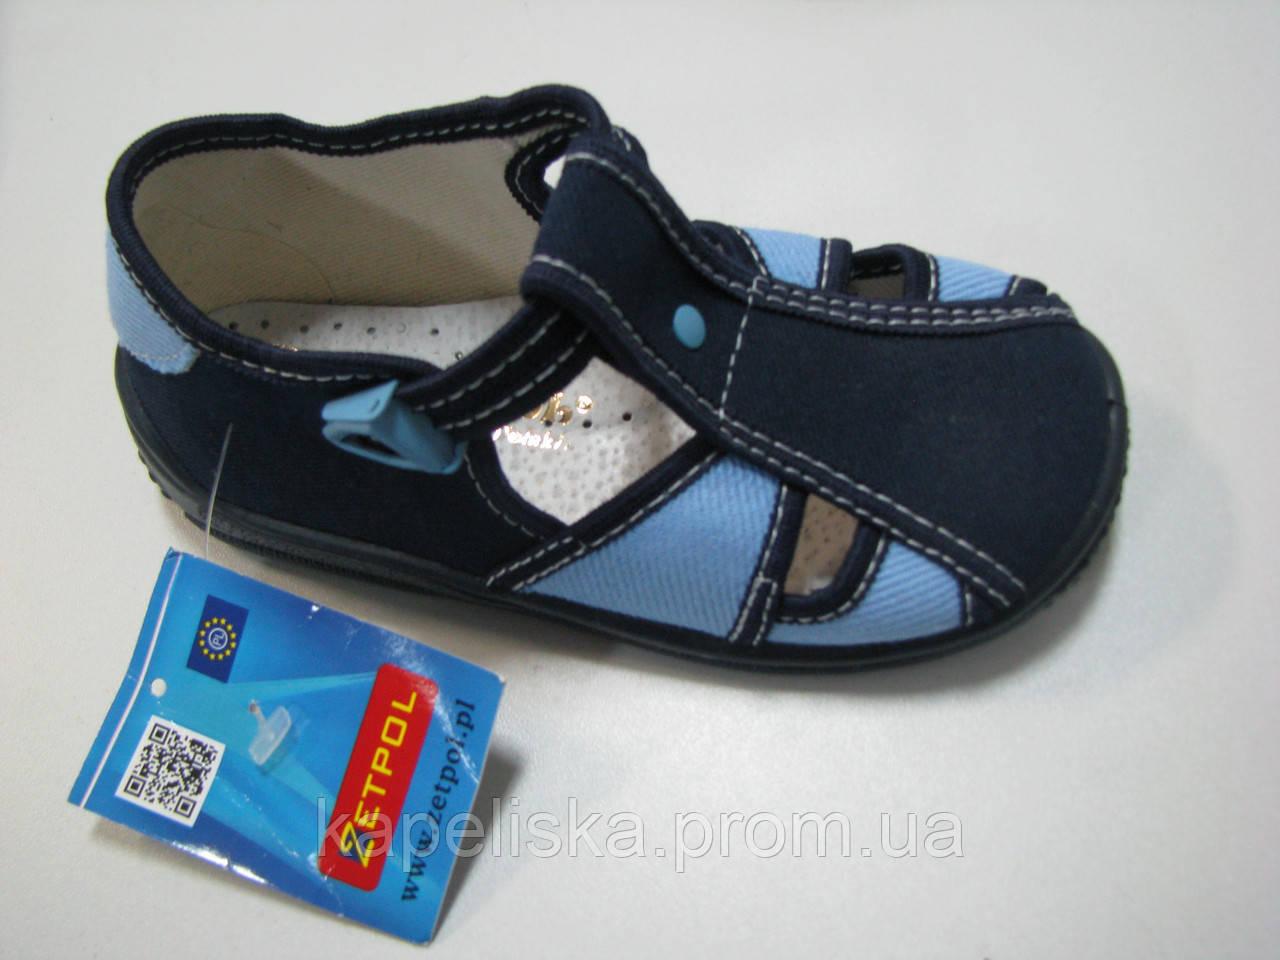 382a086cd09b78 Zetpol тапочки для хлопчика, босоножки для мальчика , цена 196 грн., купить  Київ — Prom.ua (ID#698226838)